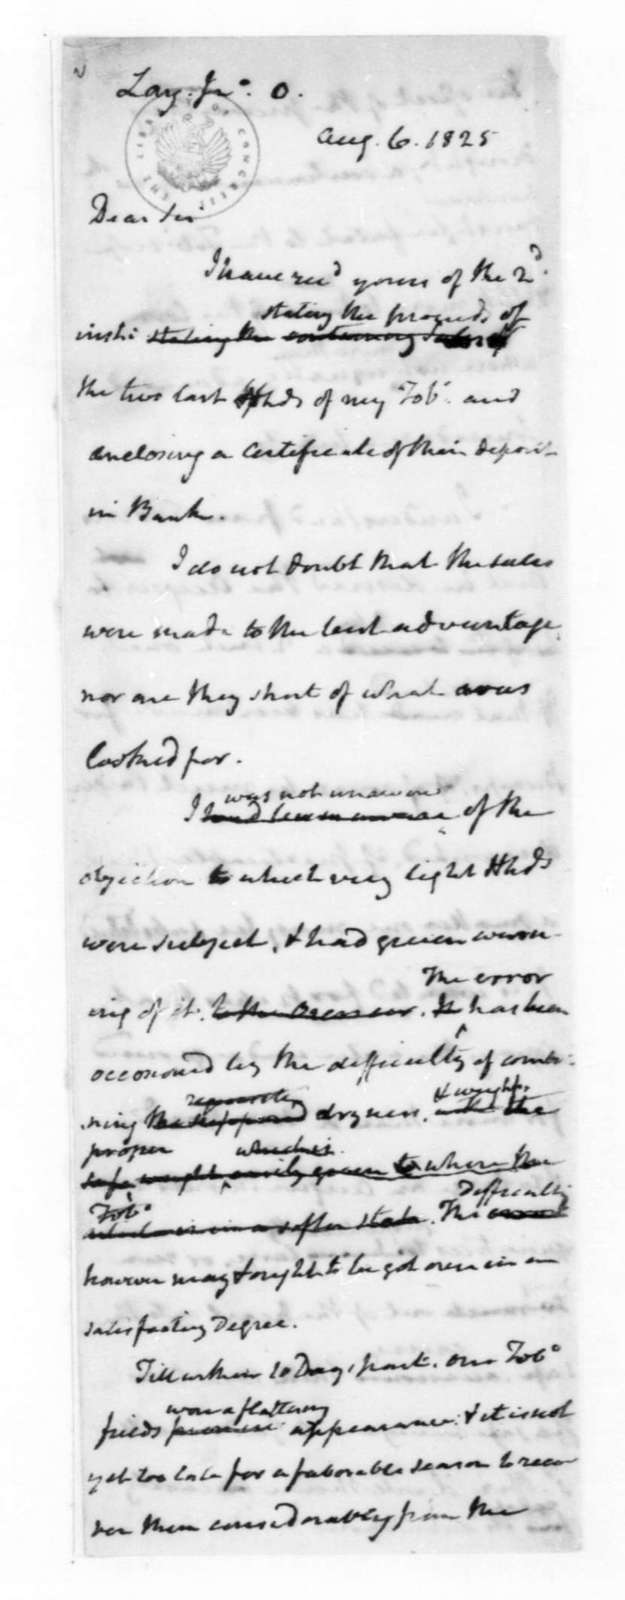 James Madison to John O. Lay, August 6, 1825.